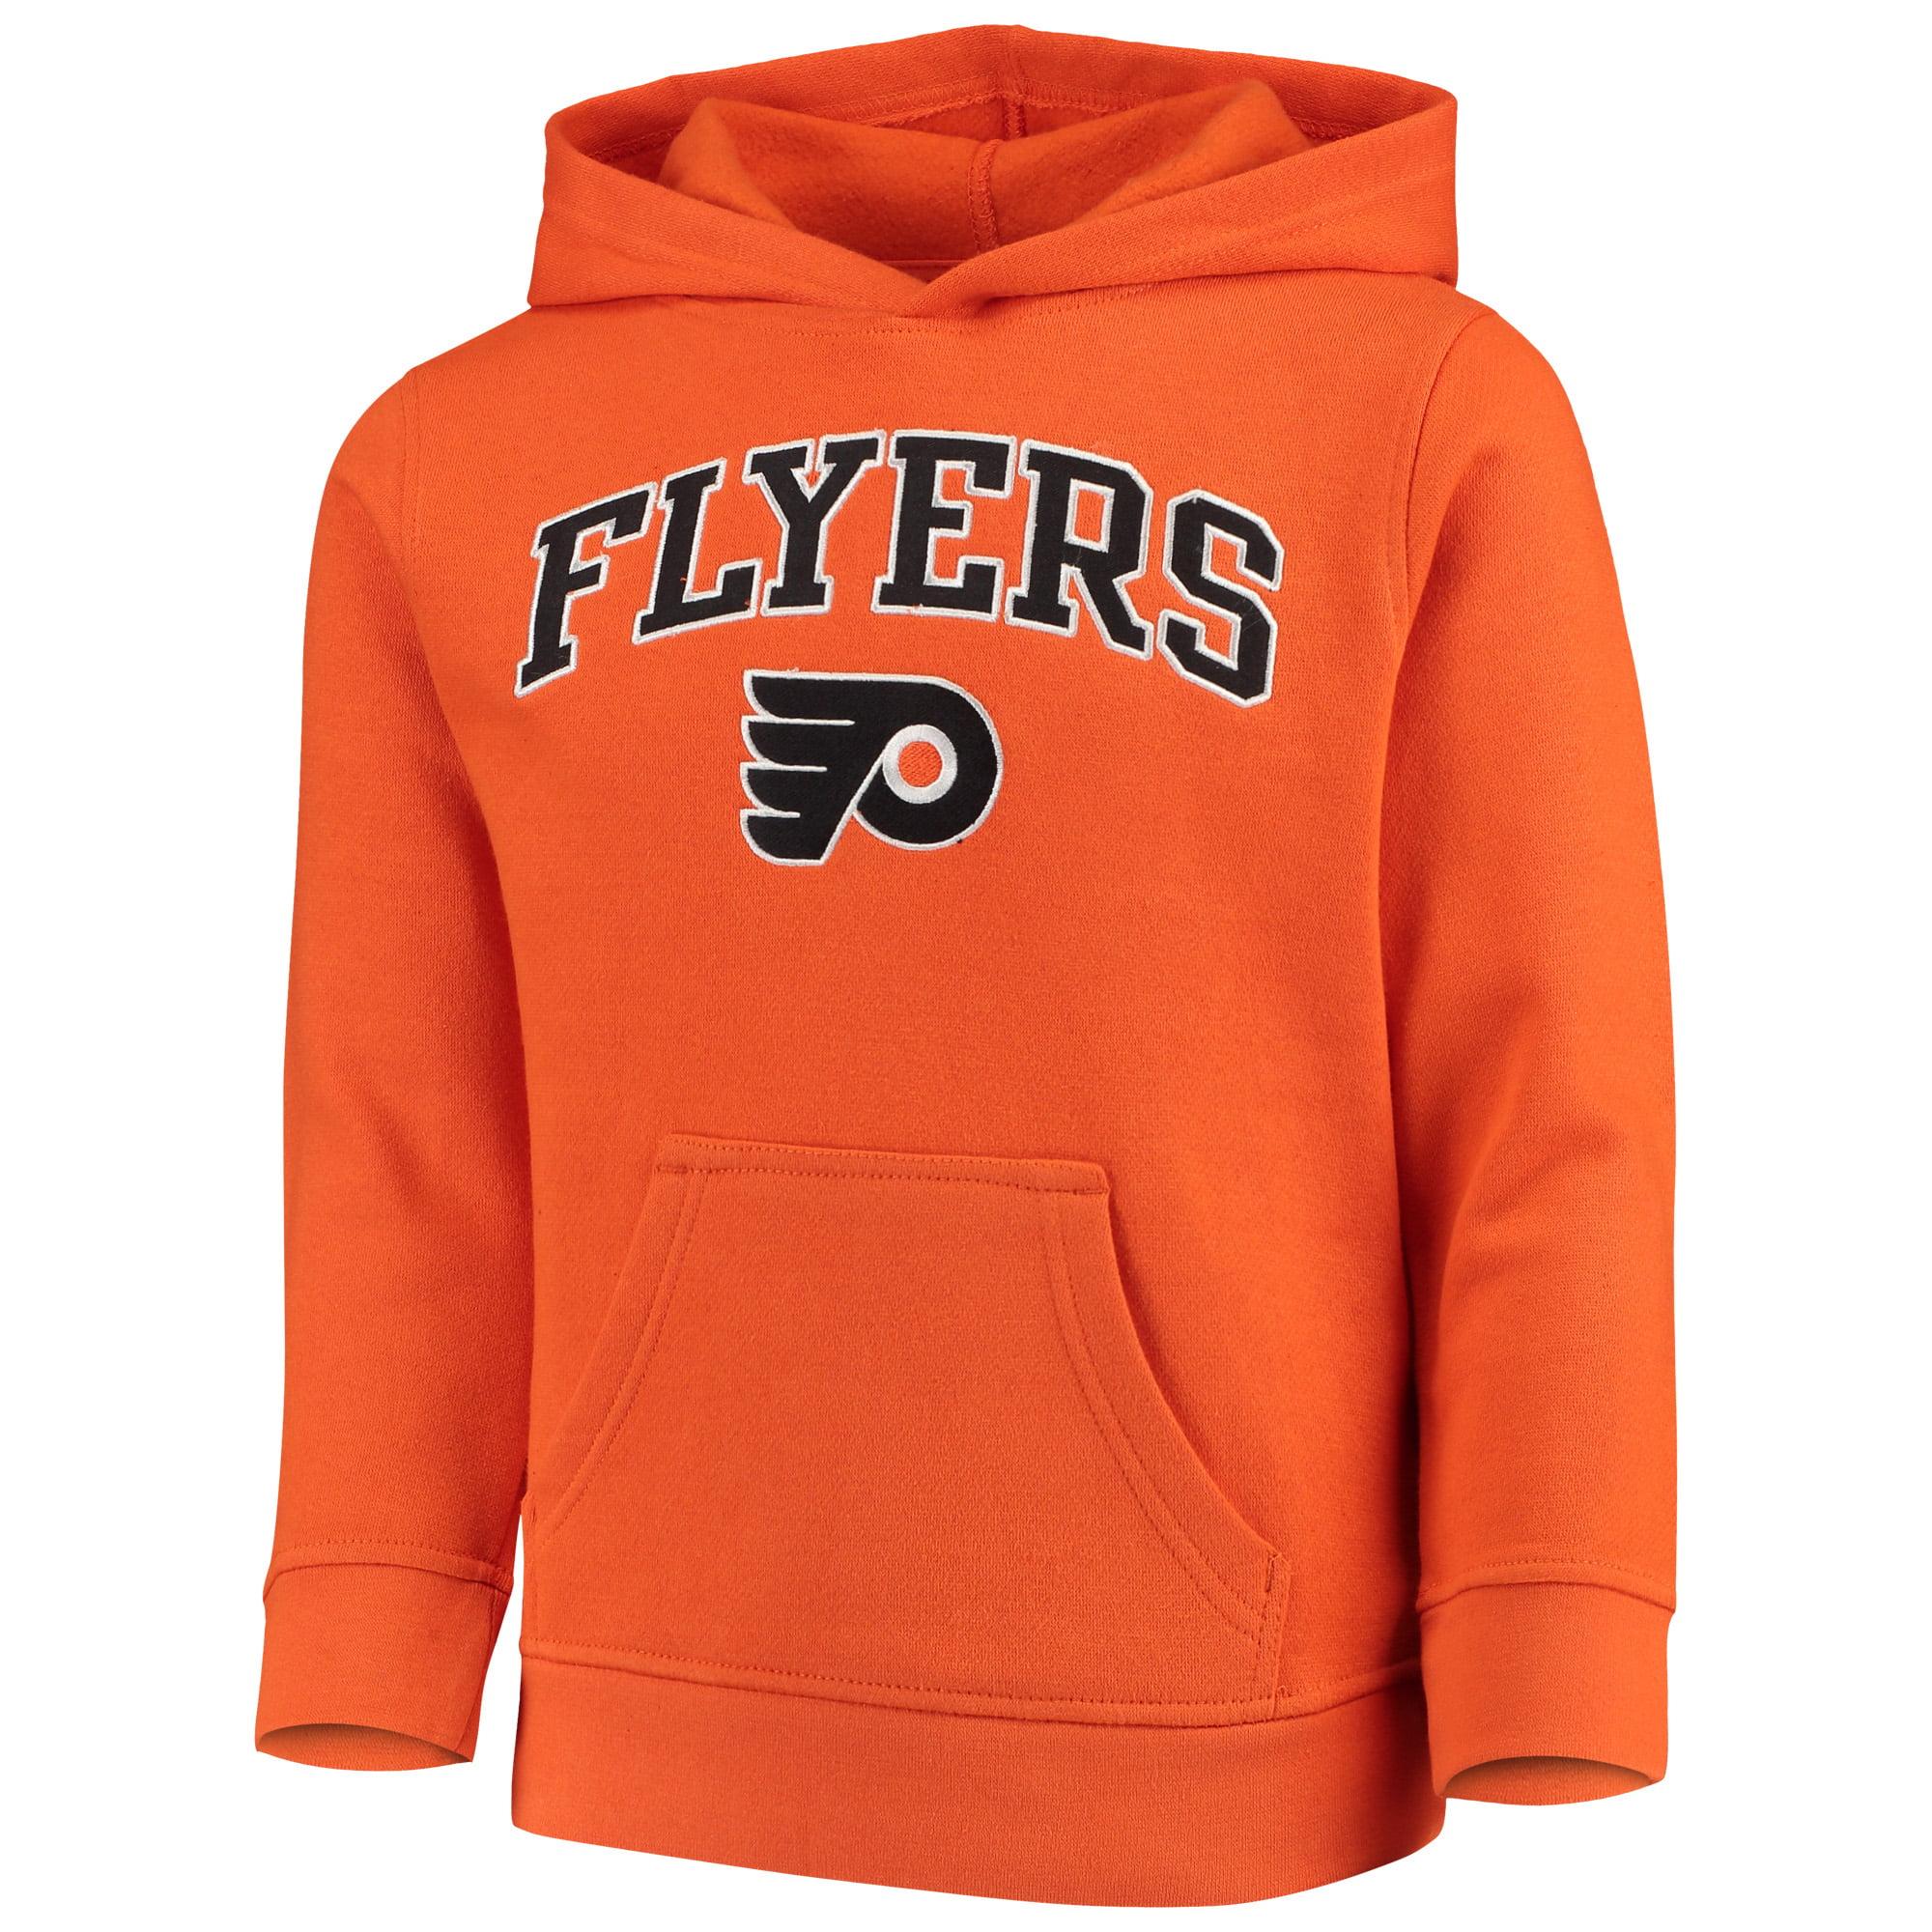 Youth Orange Philadelphia Flyers Team Logo Pullover Hoodie